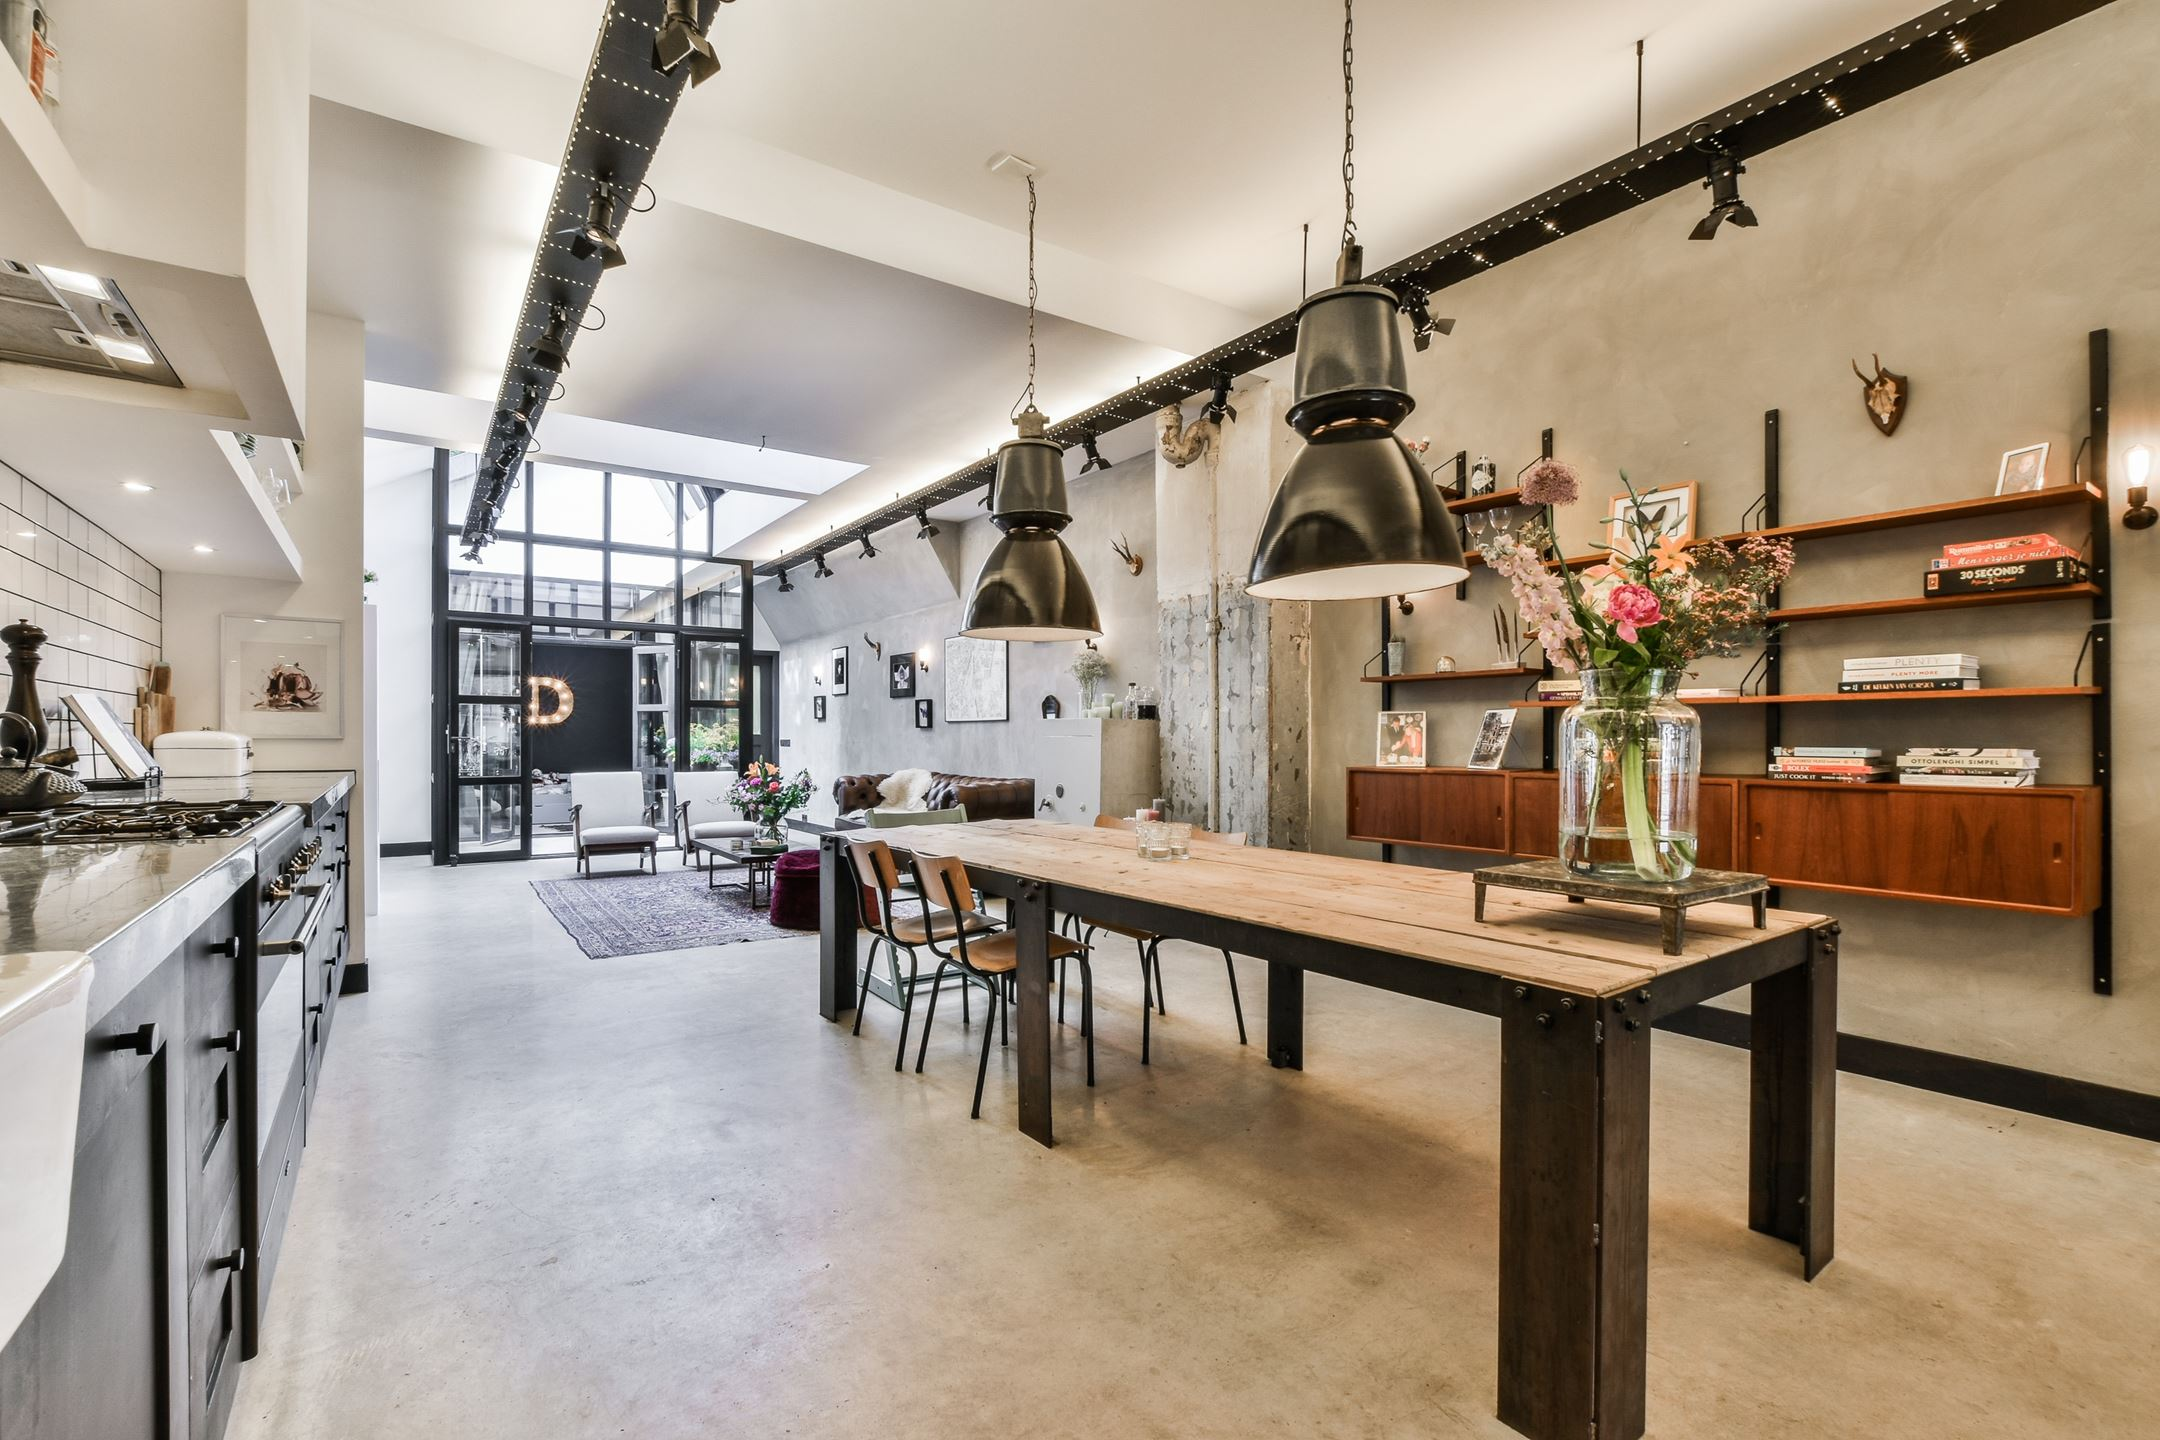 The Nordroom - Garage Conversion Amsterdam7.jpg